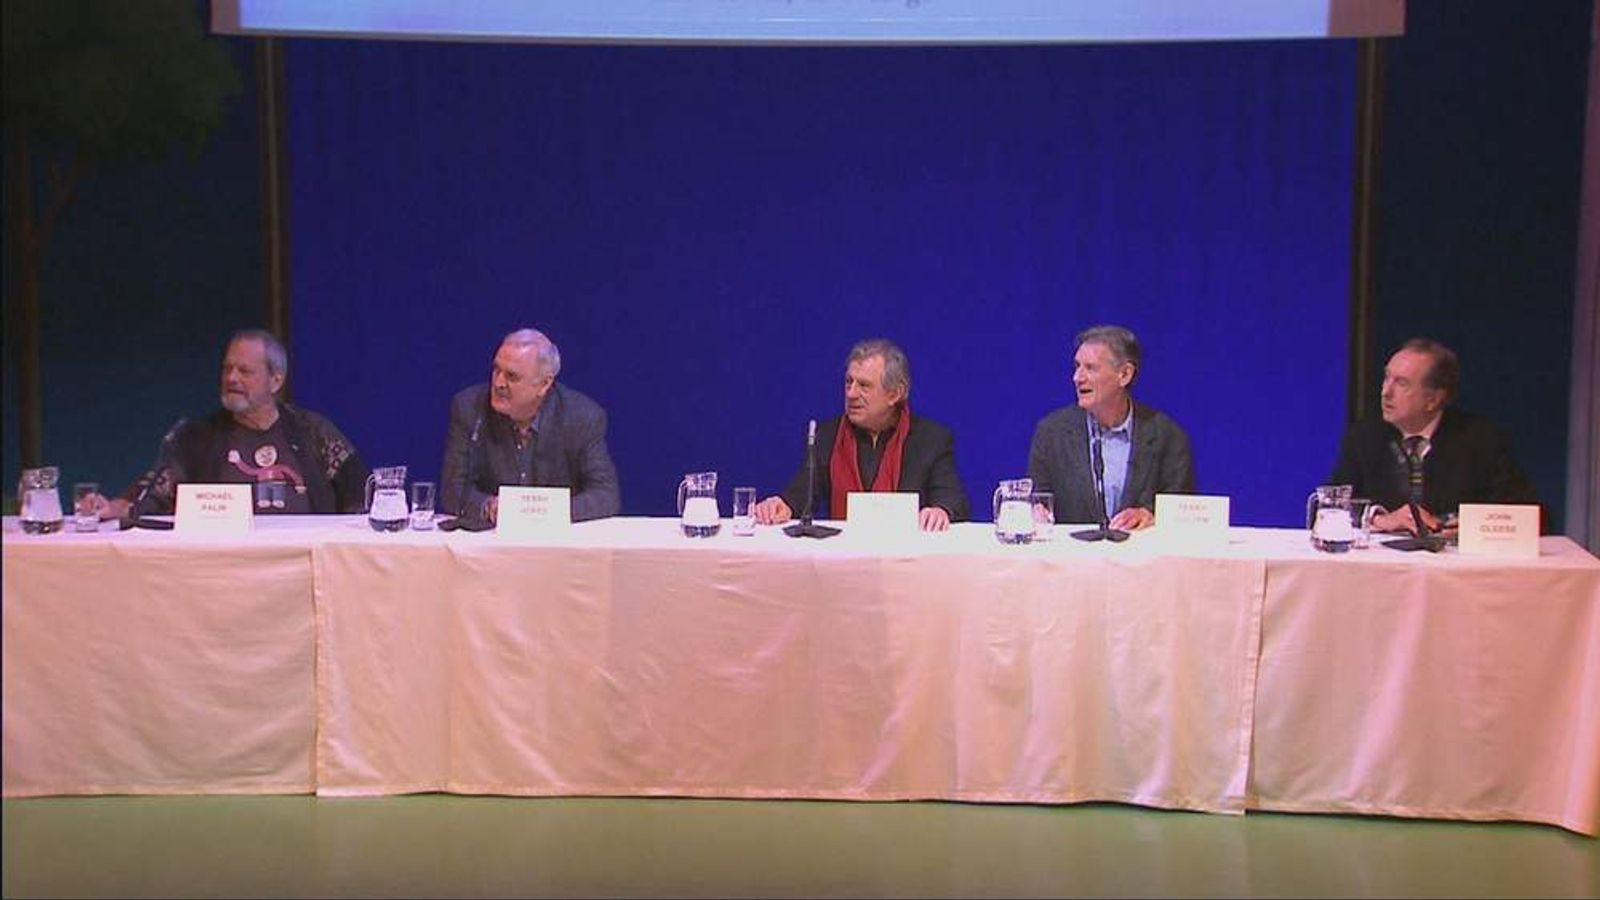 Monty Python reunion press conference